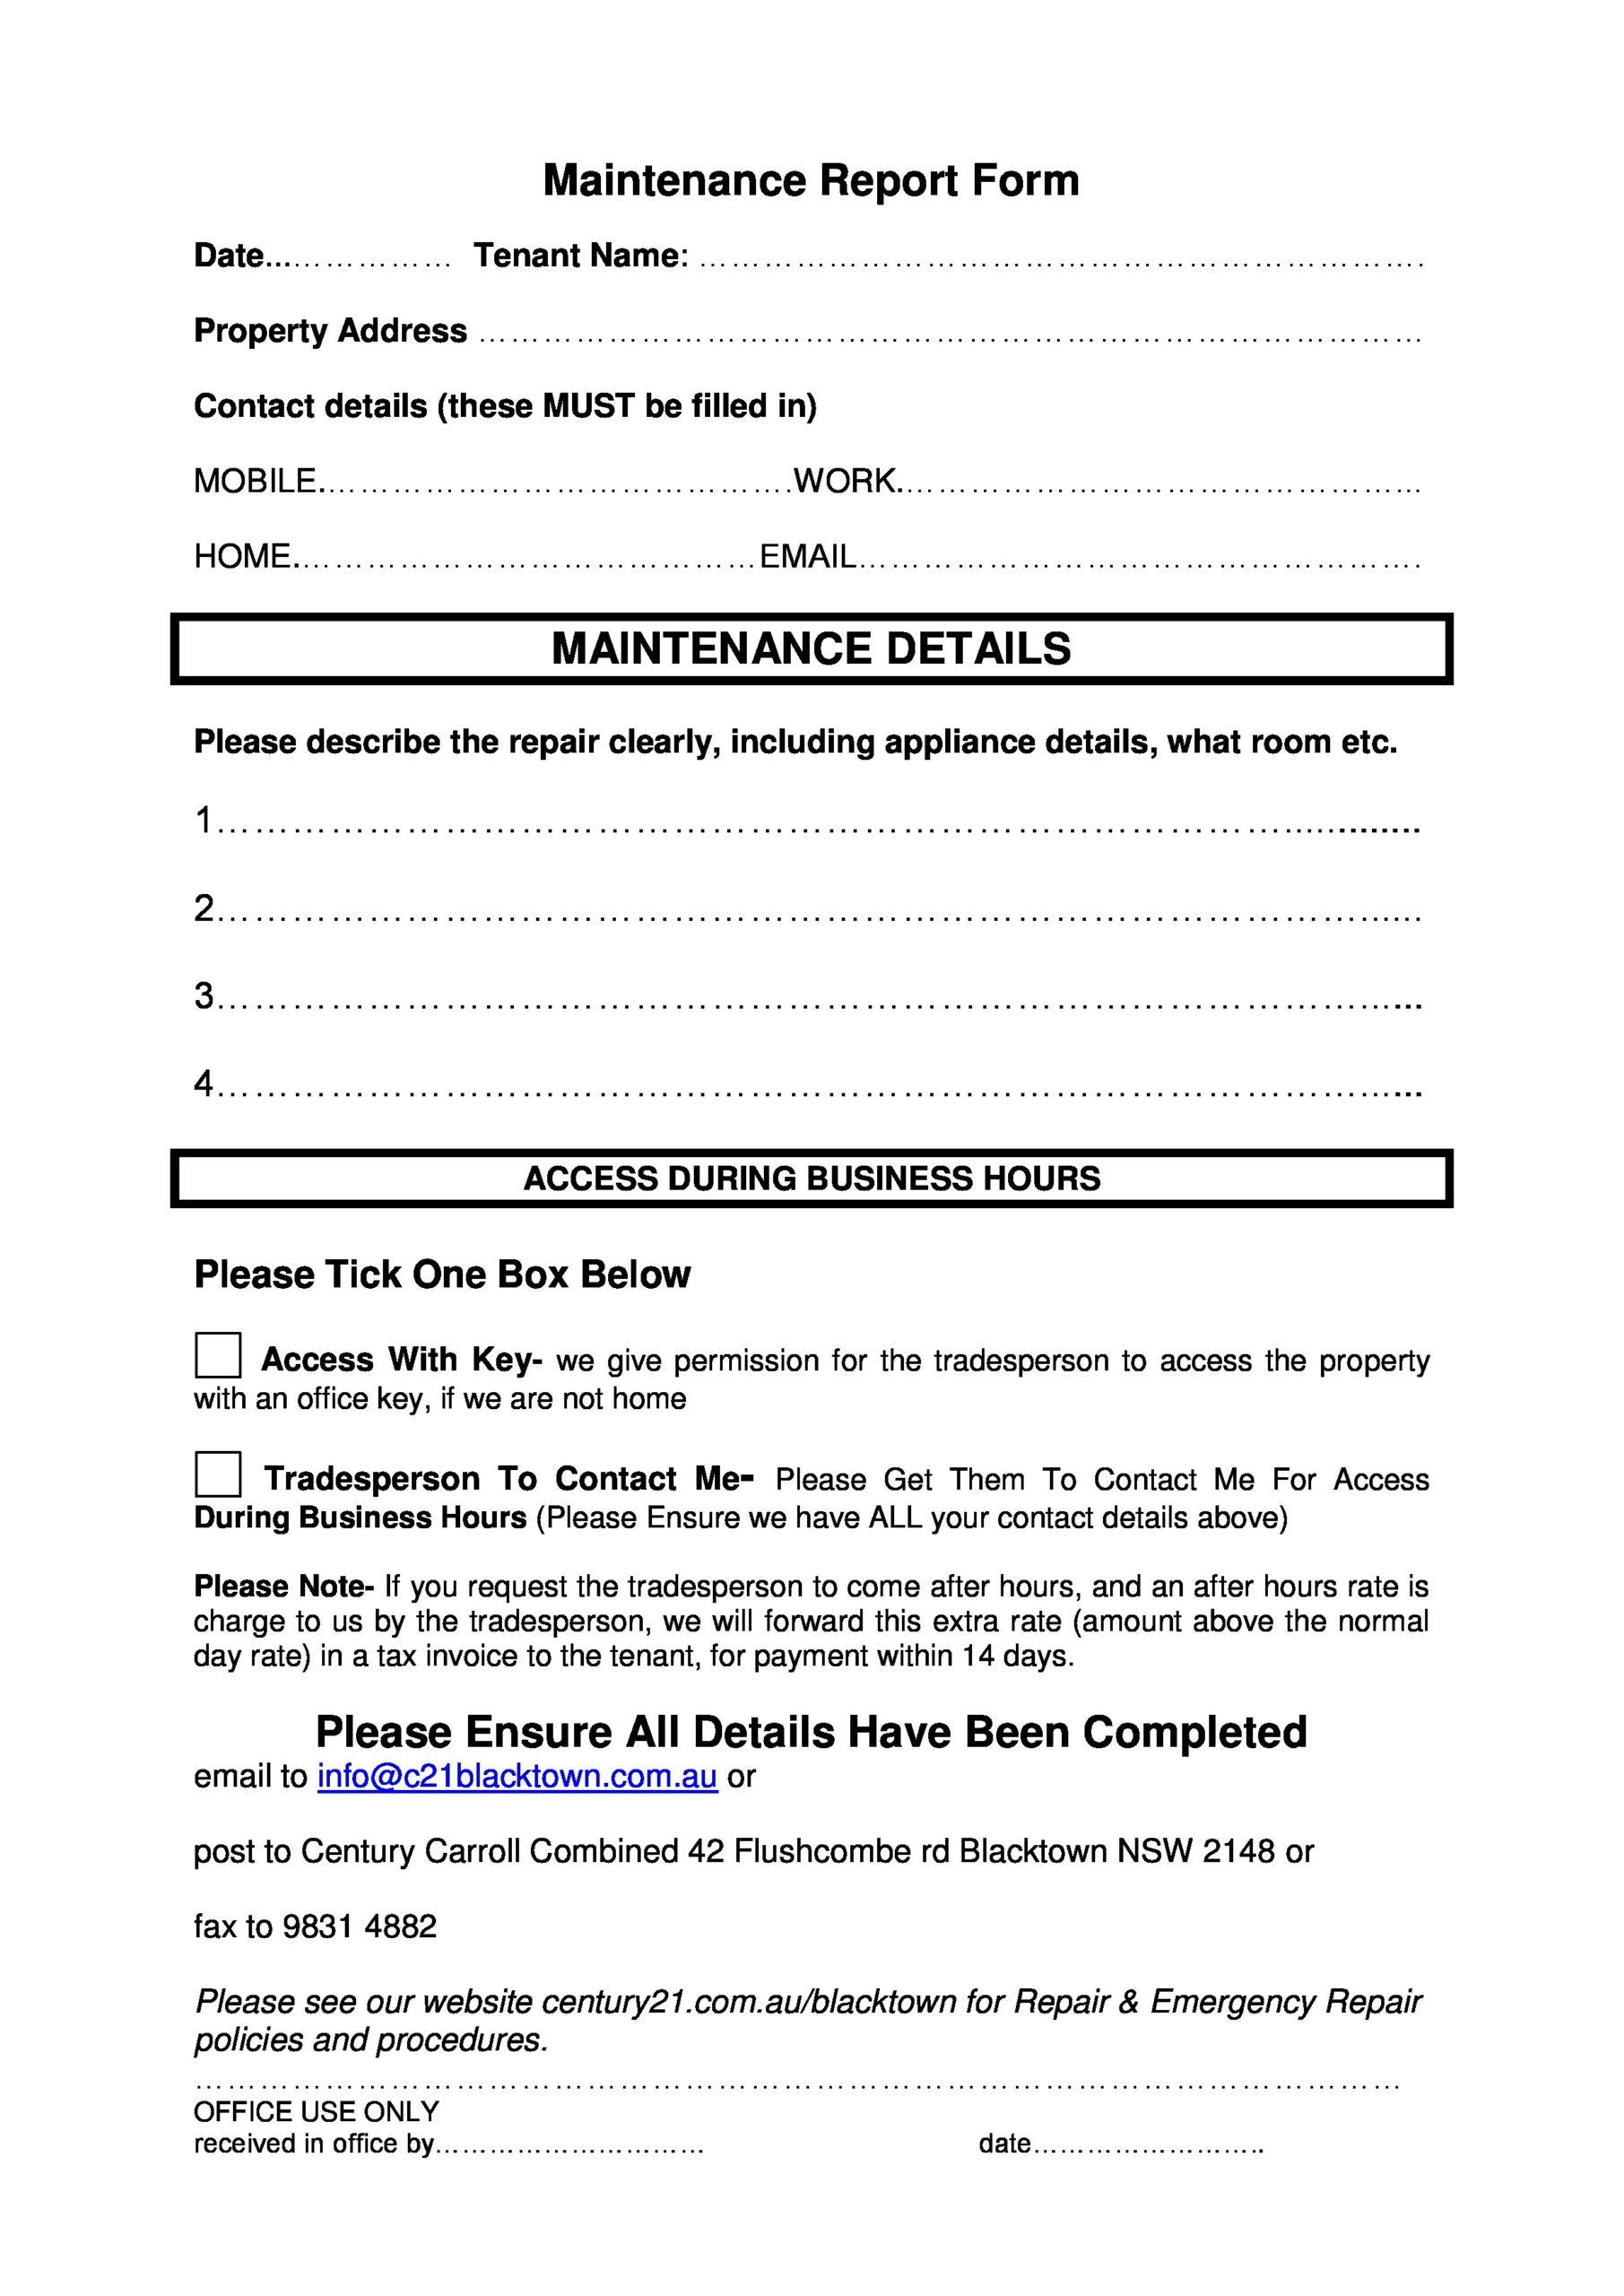 Free maintenance report form 41